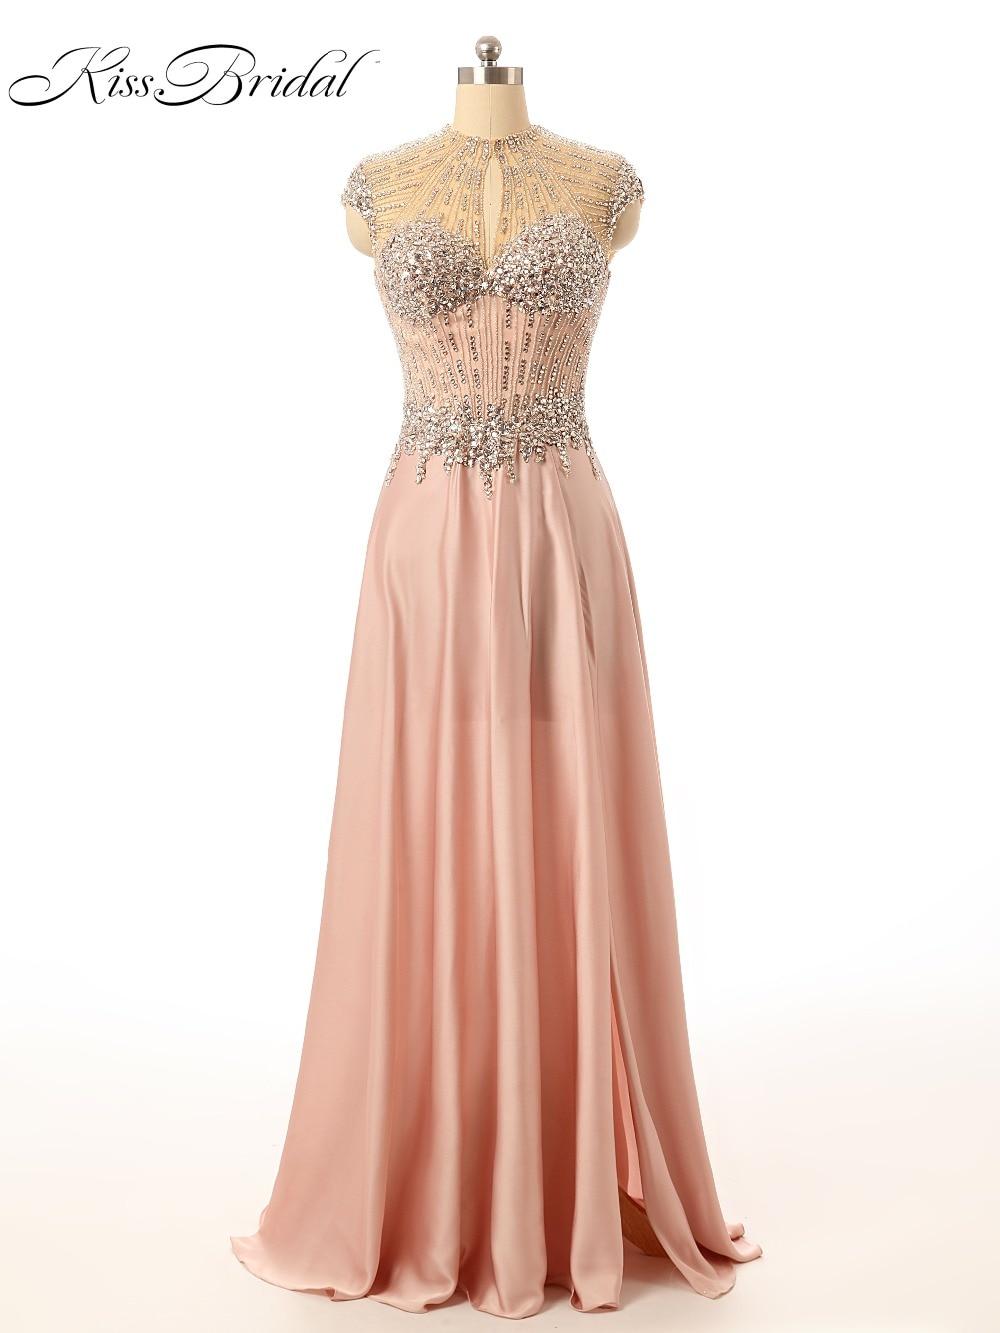 2017 Party   Prom     Dresses   Vestido de Festa O-Neck Sleeveless A-Line Floor Length Keyhole Back Beaded Formal Evening Gowns